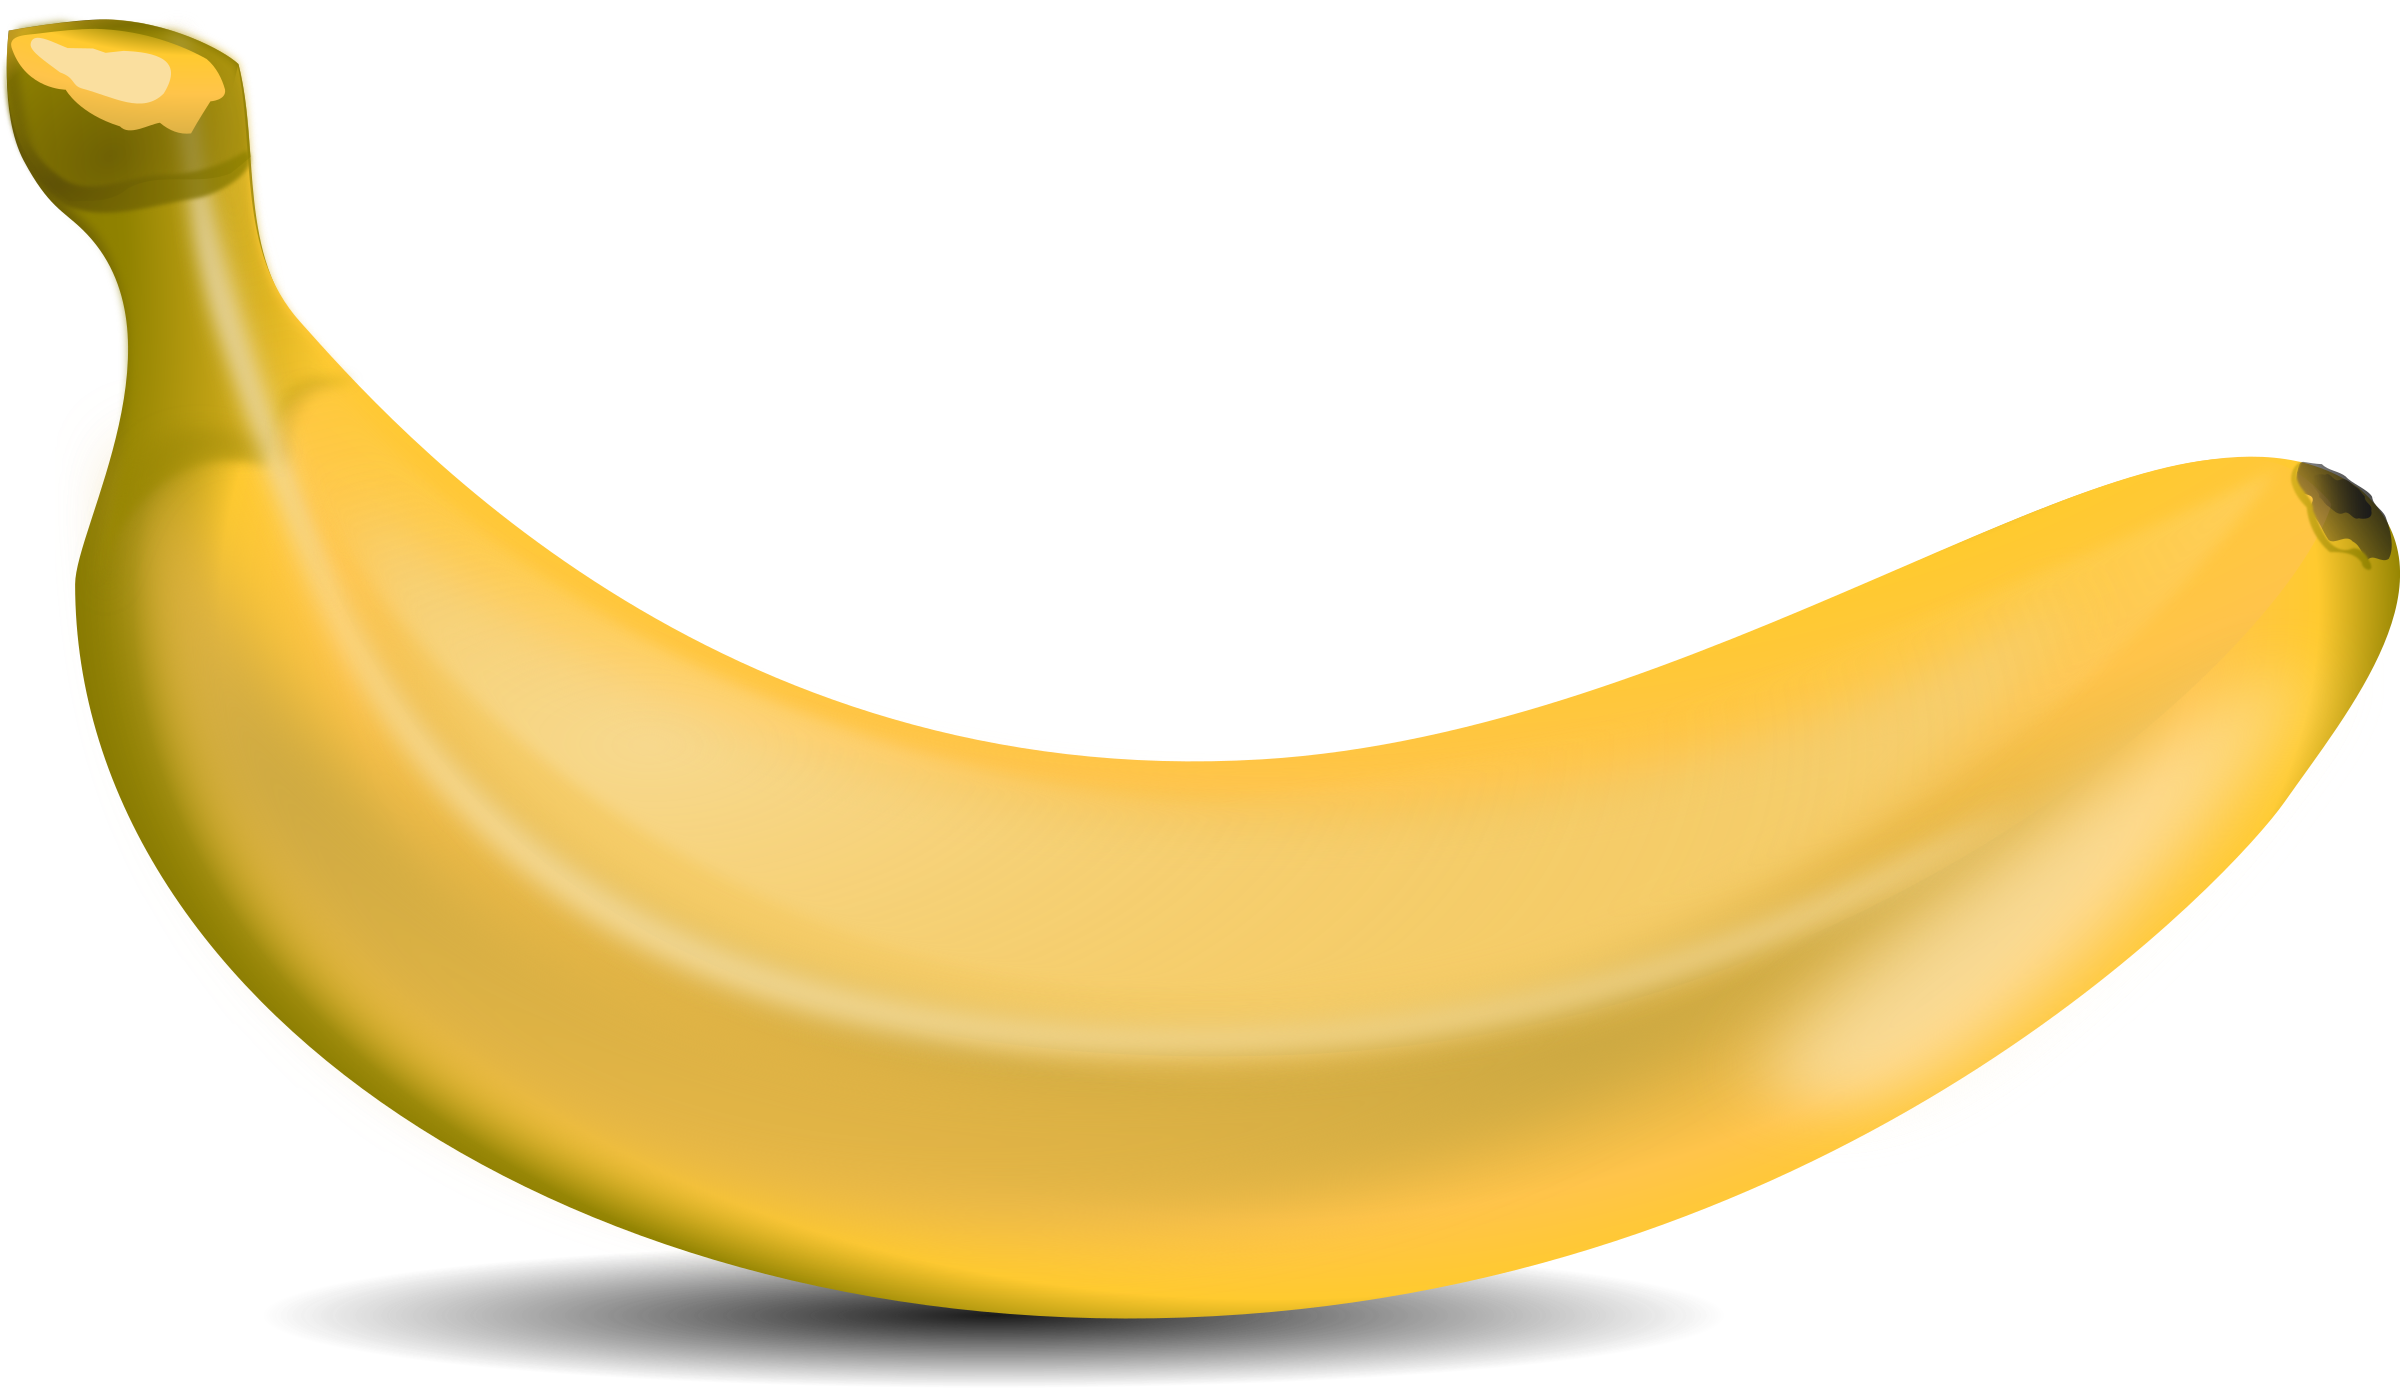 2400x1388 Banana Images Transparent Free Download Clip Art